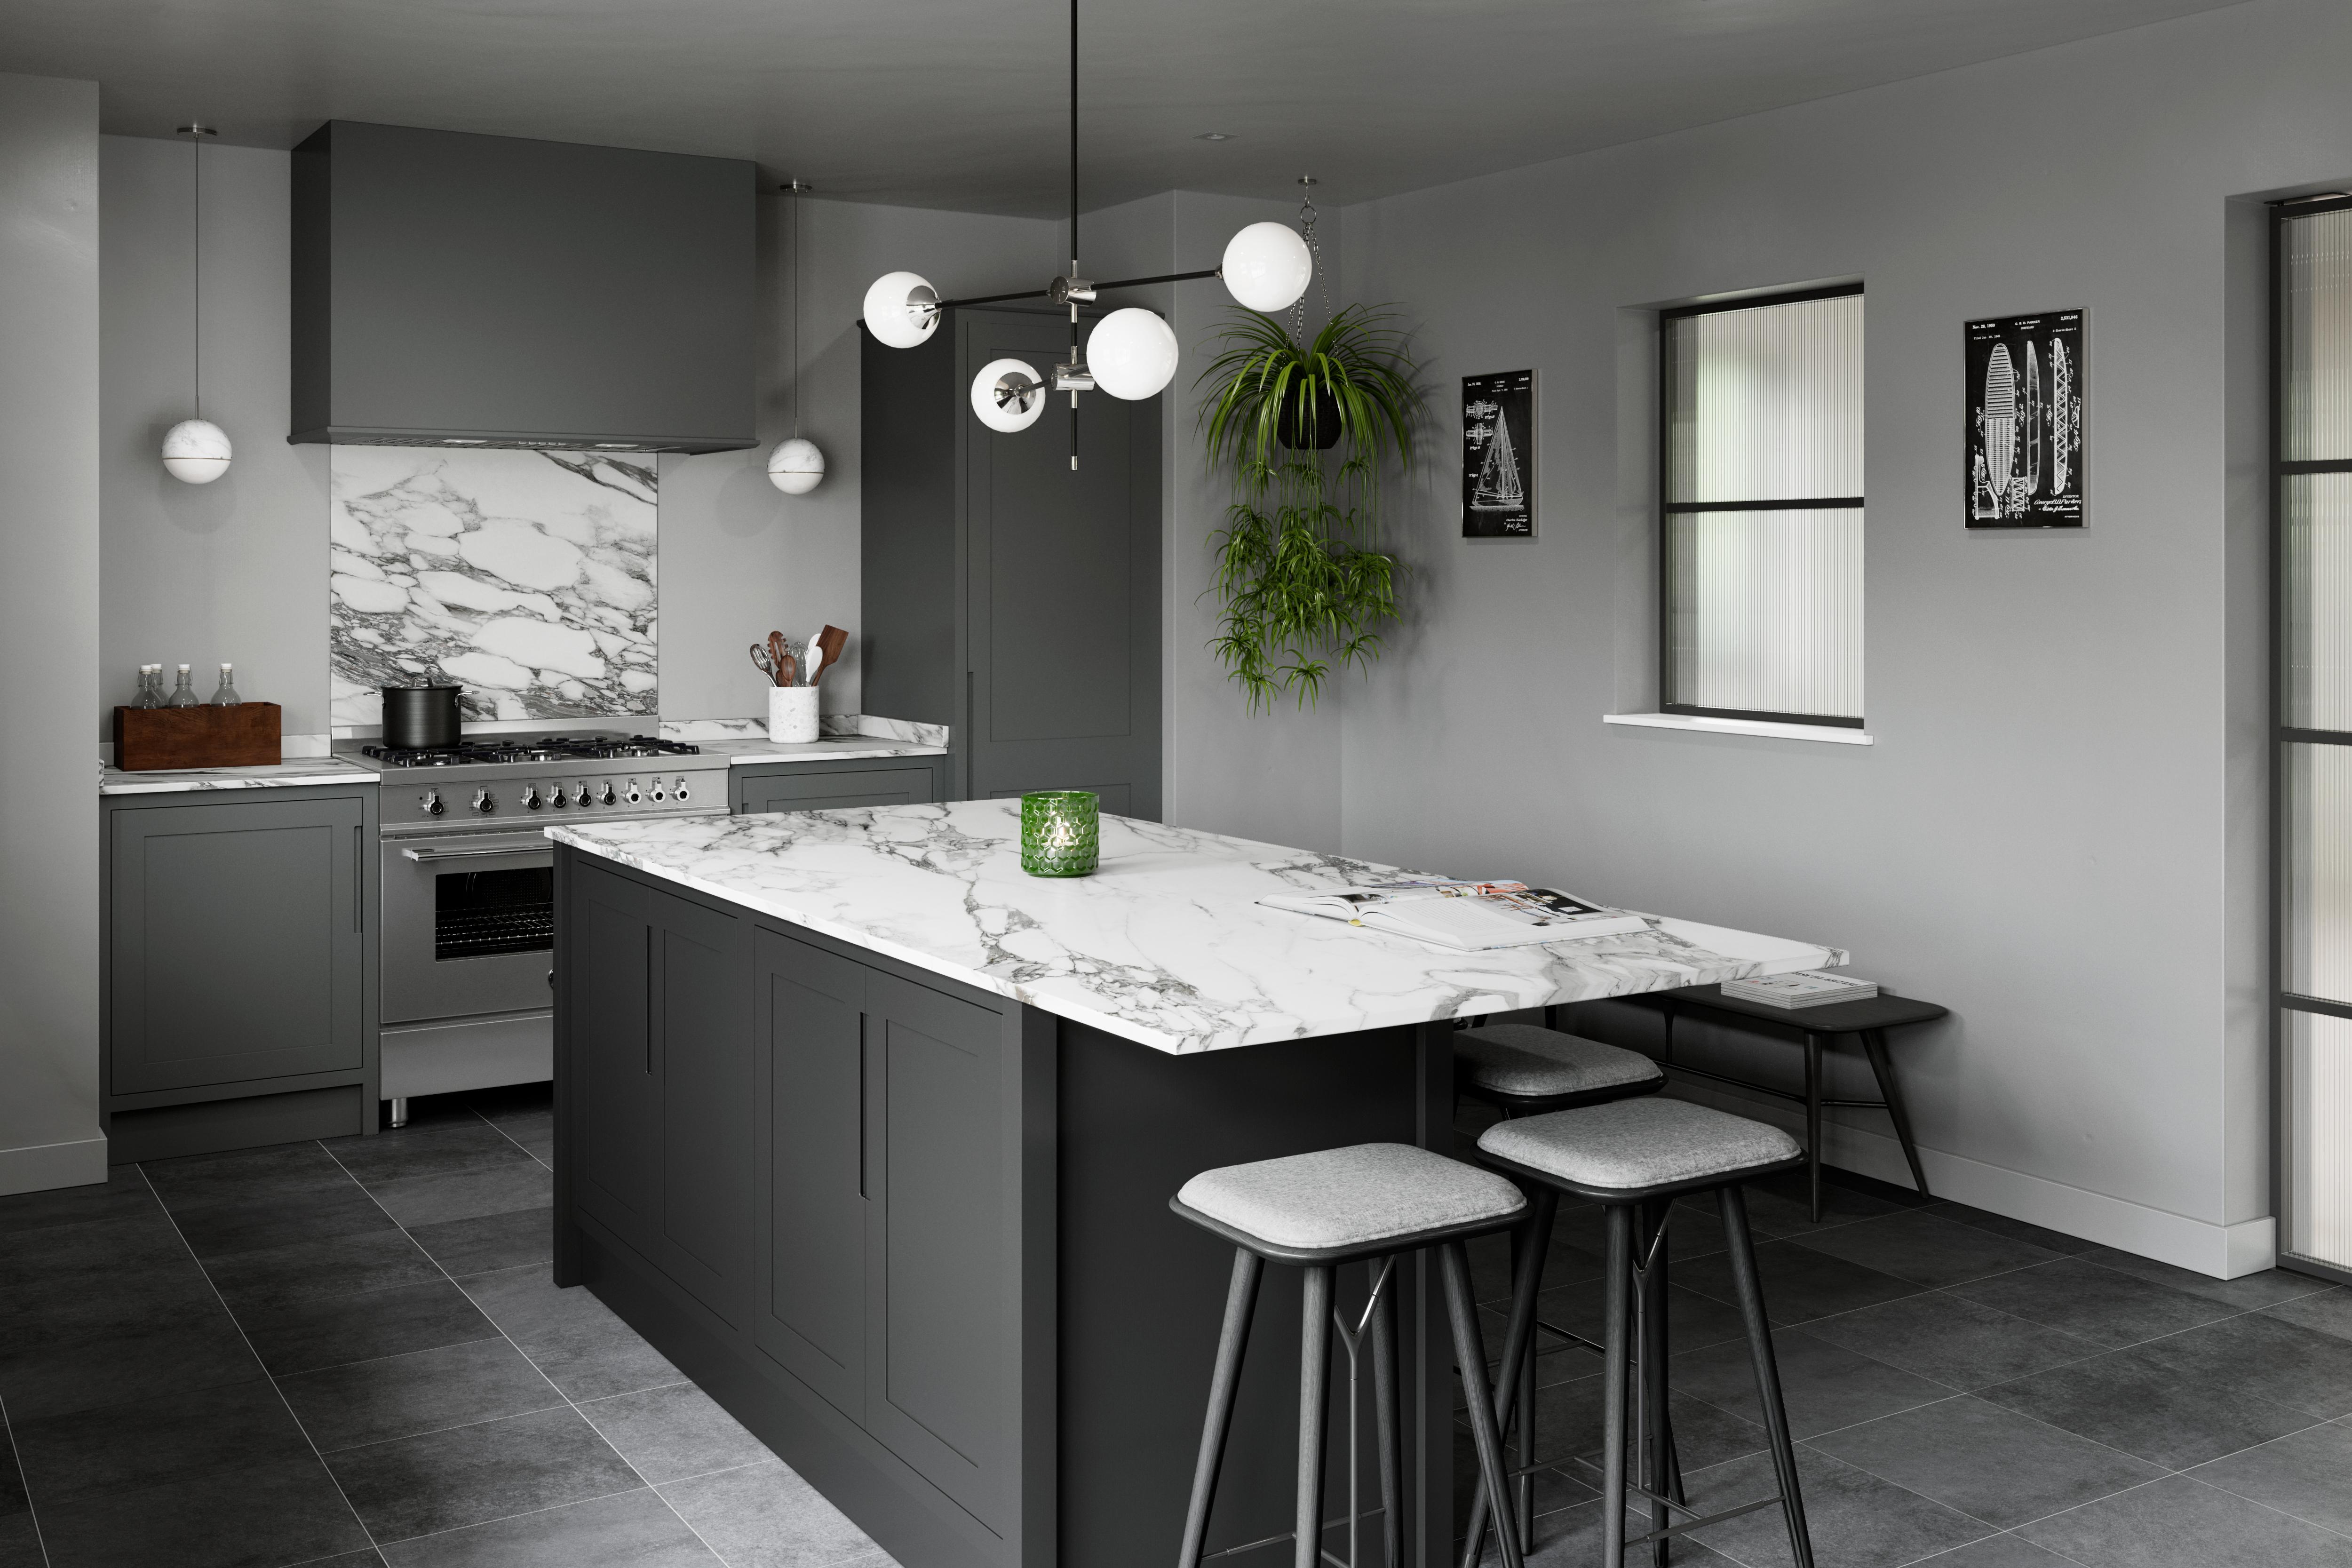 Ex display shaker style Studio CK kitchen range cooker side view